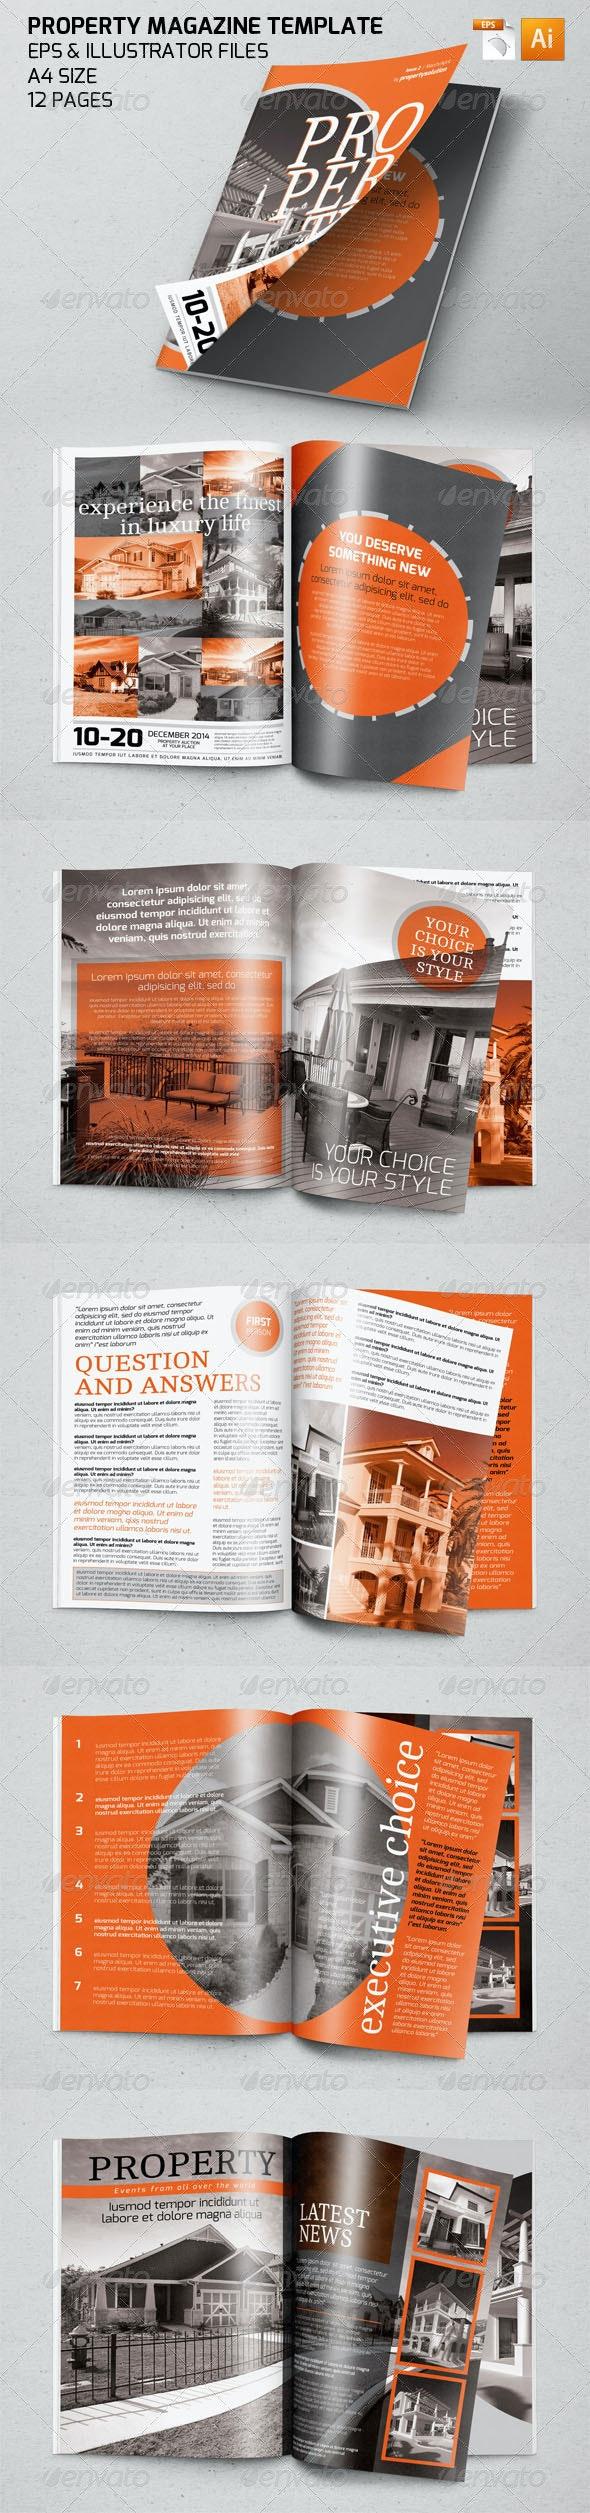 Property Magazine Template - Magazines Print Templates